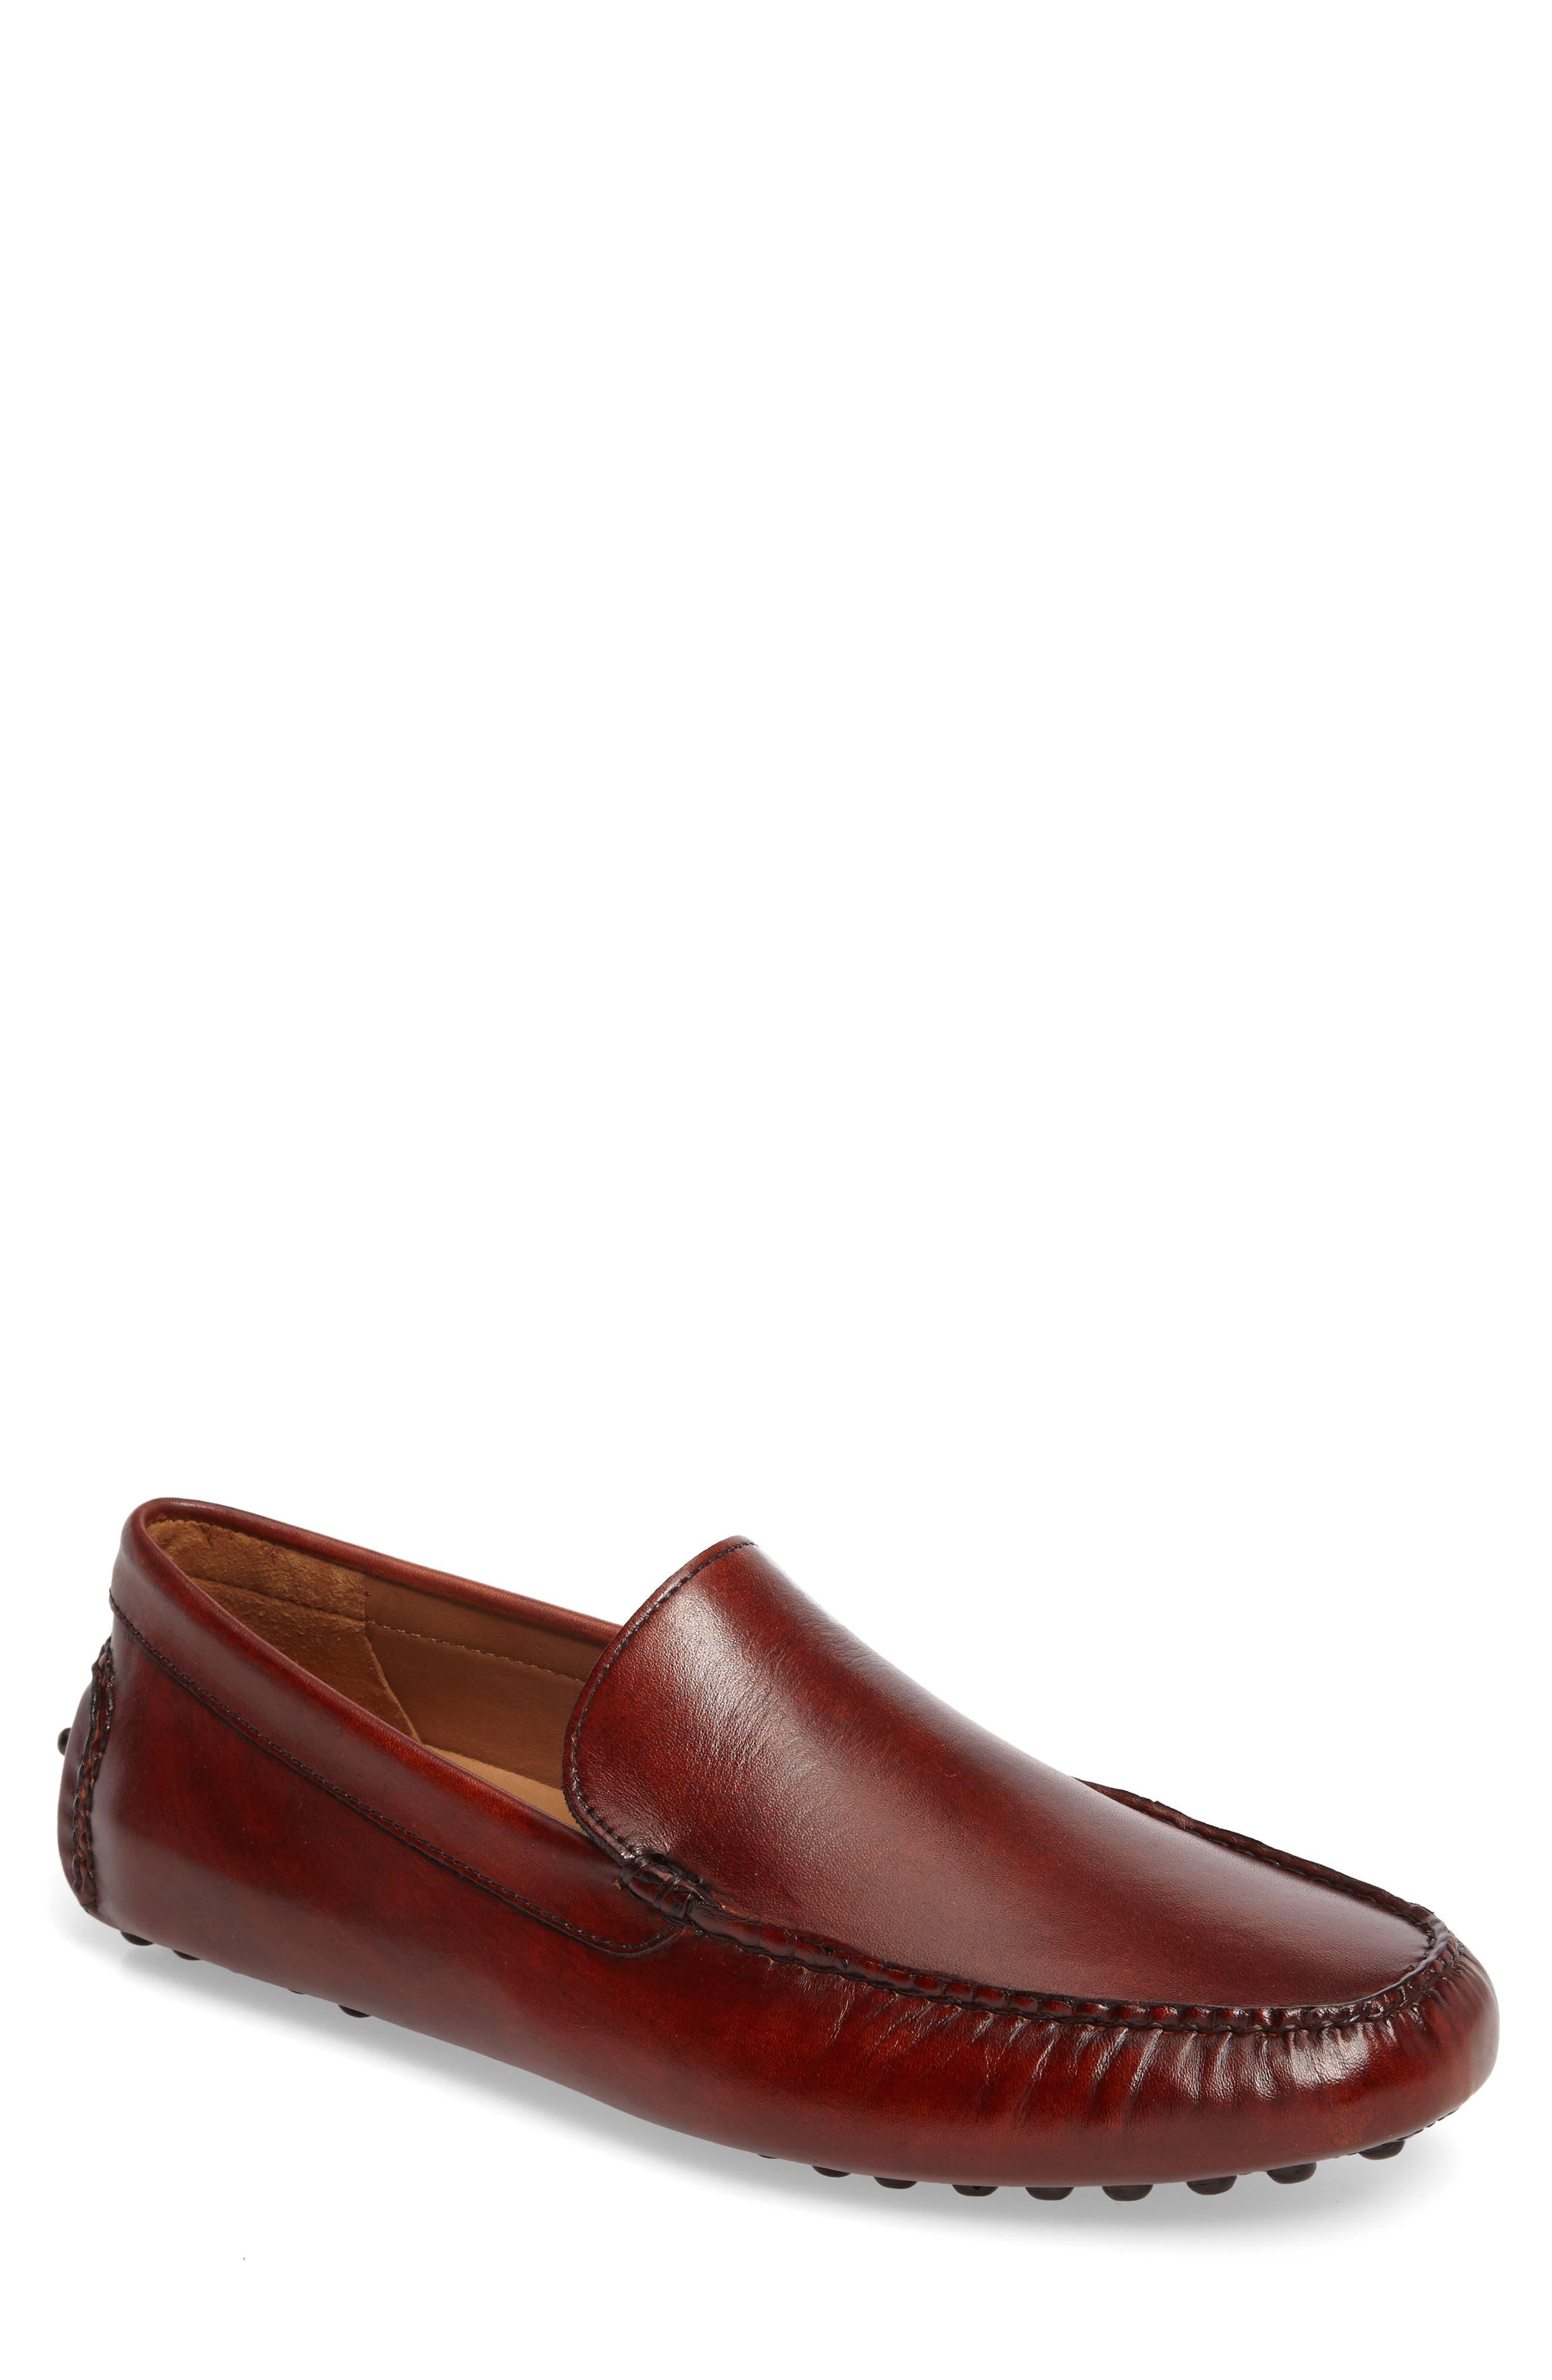 Main Image - John W. Nordstrom® Cane Driving Shoe (Men)